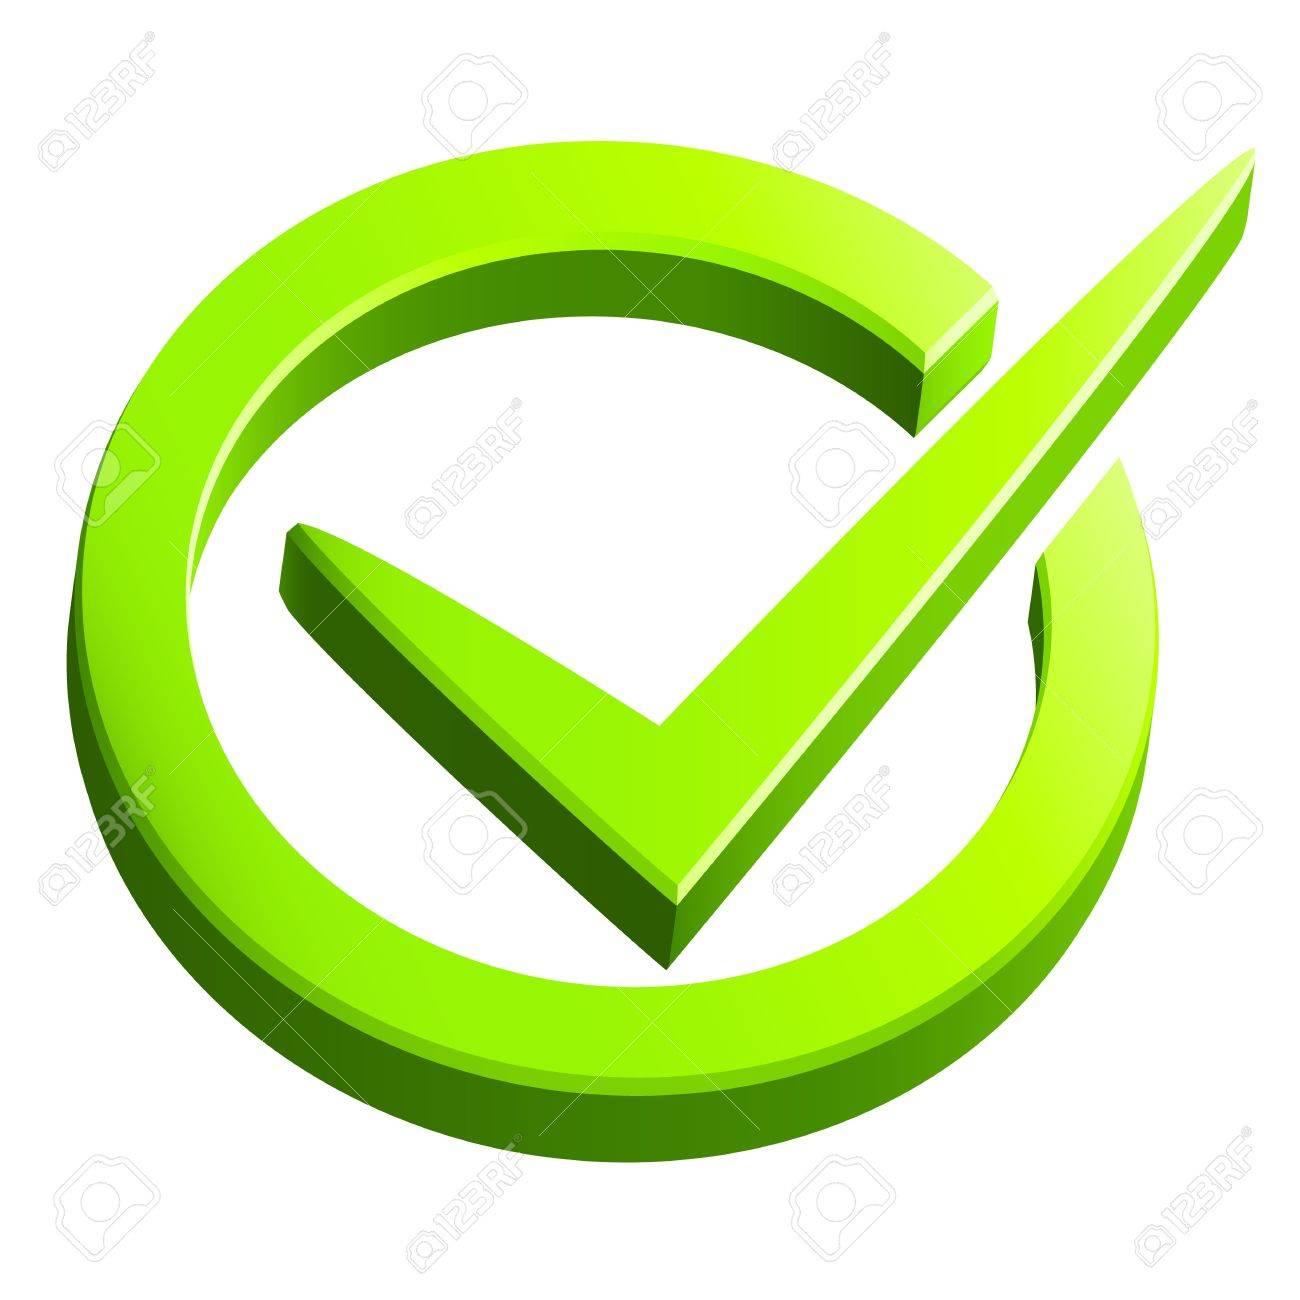 check mark symbol - 20352841